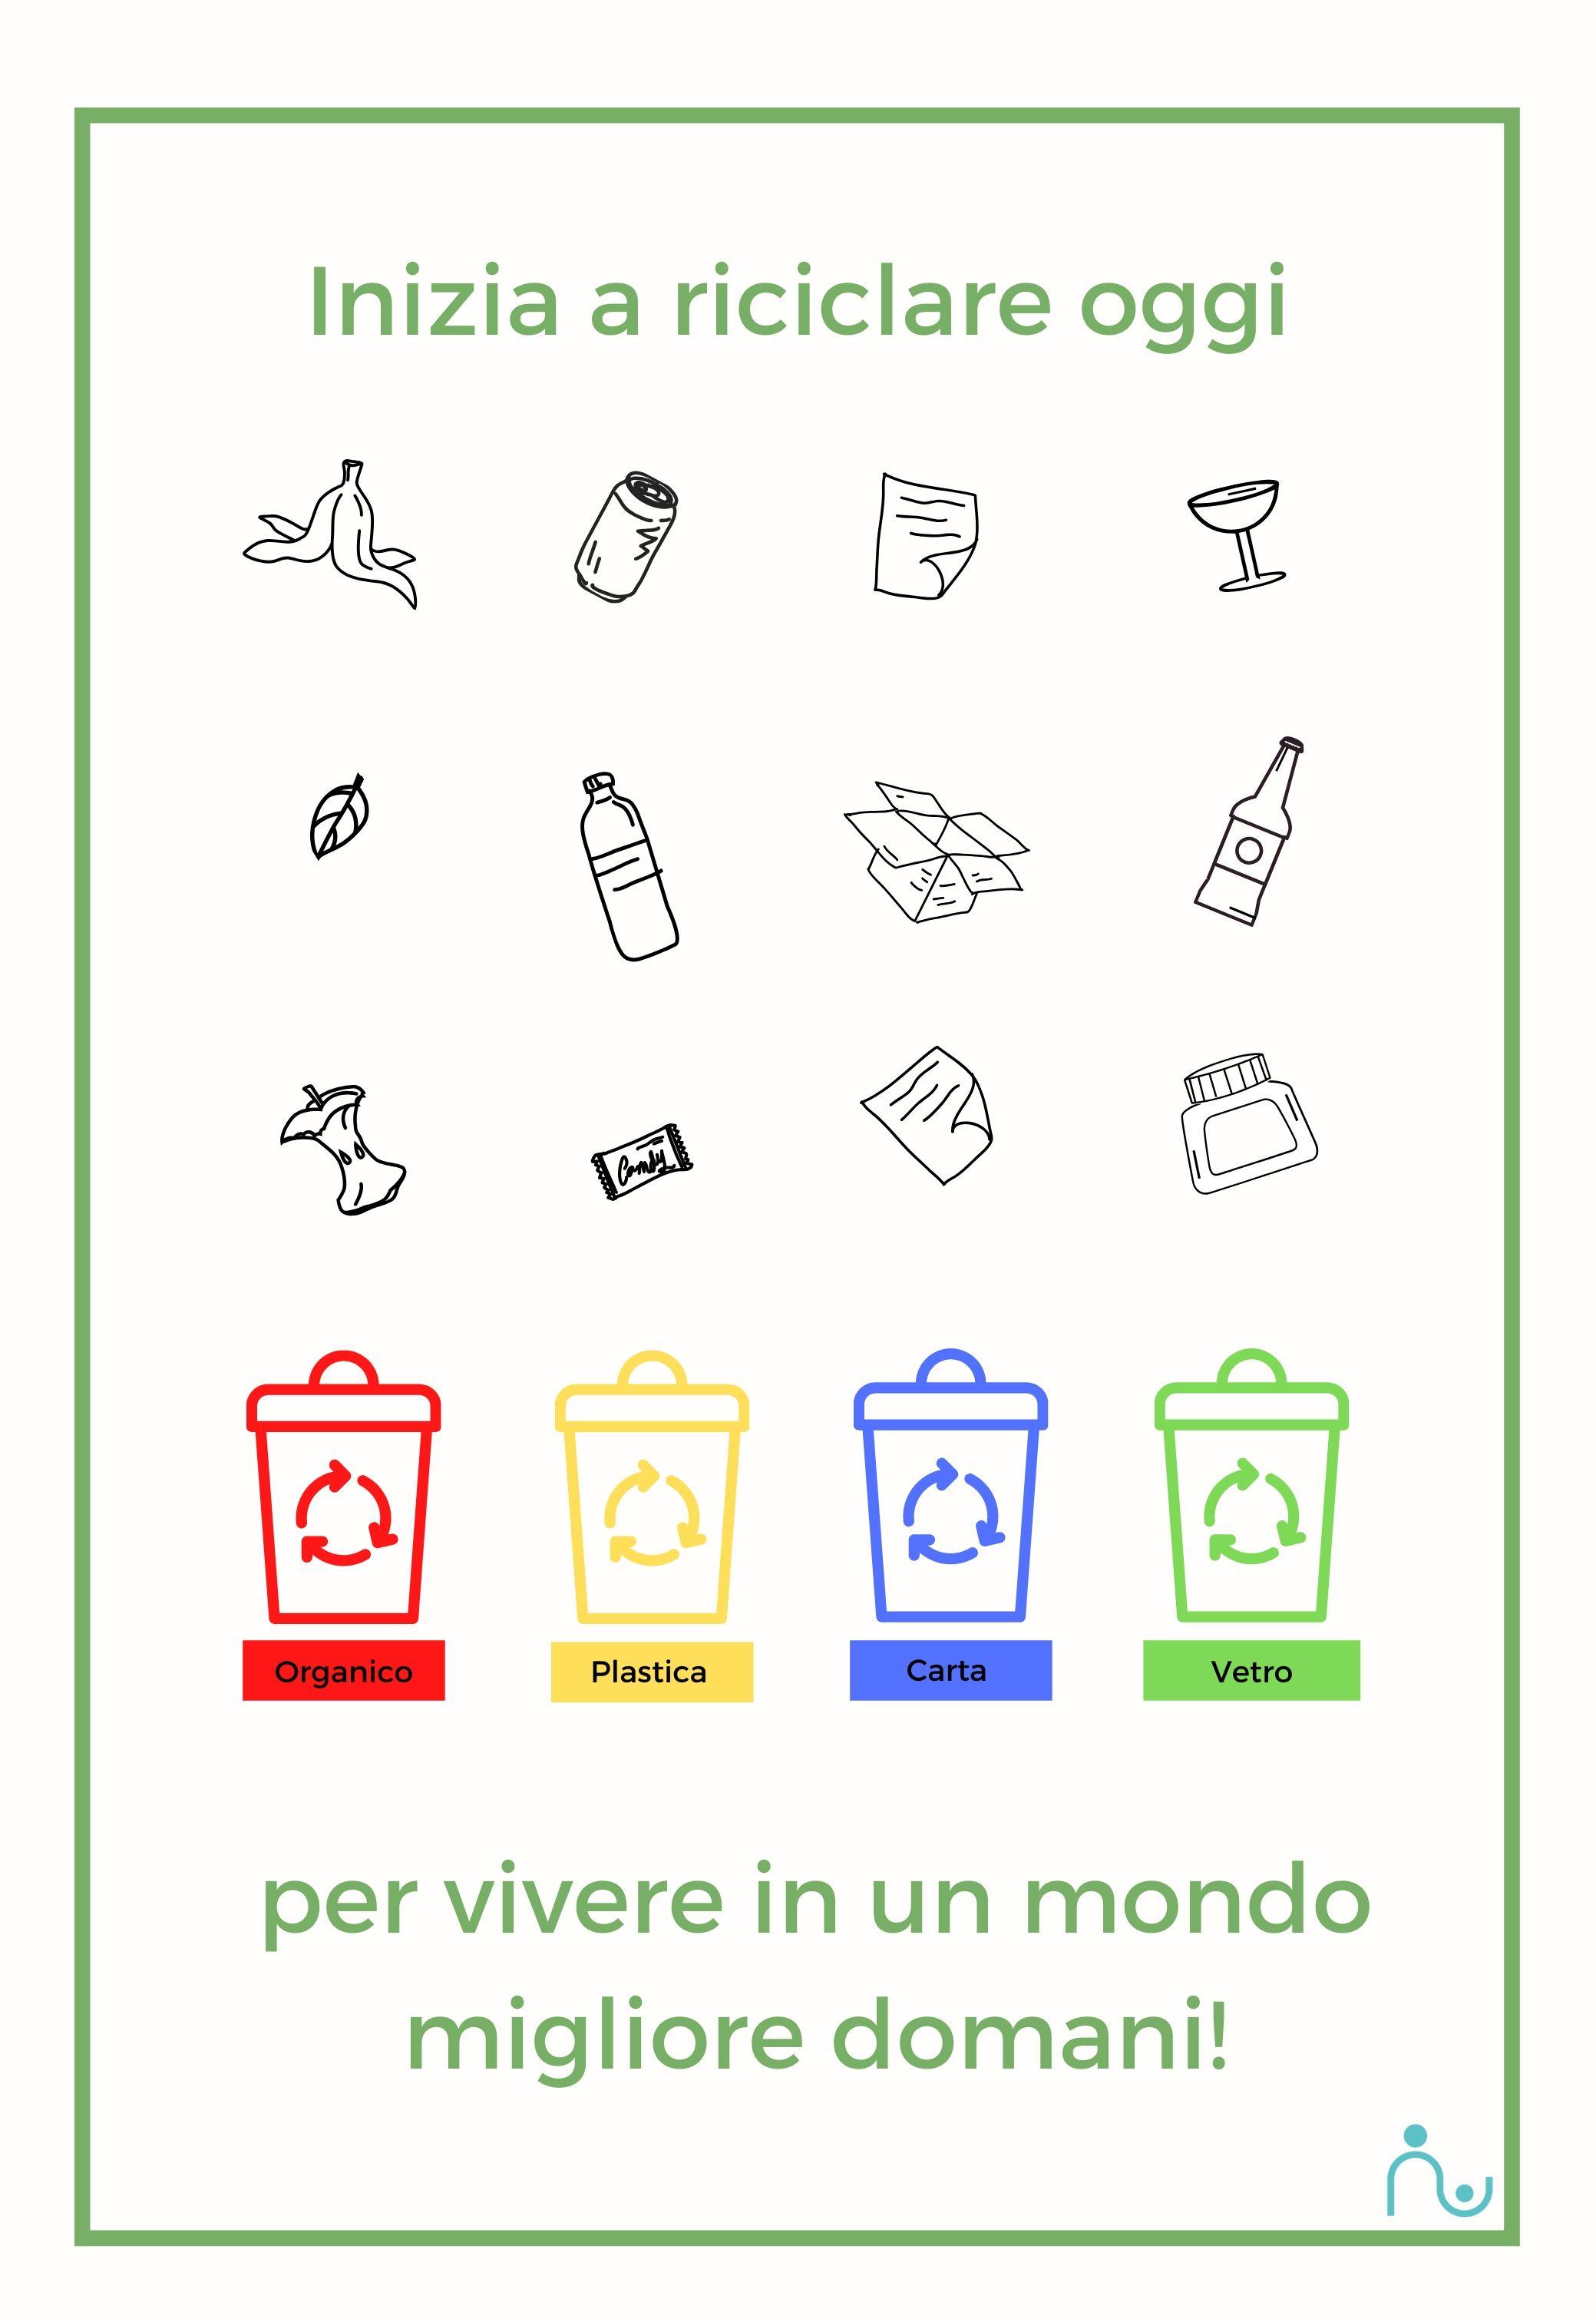 Come riciclare insieme ai bambini